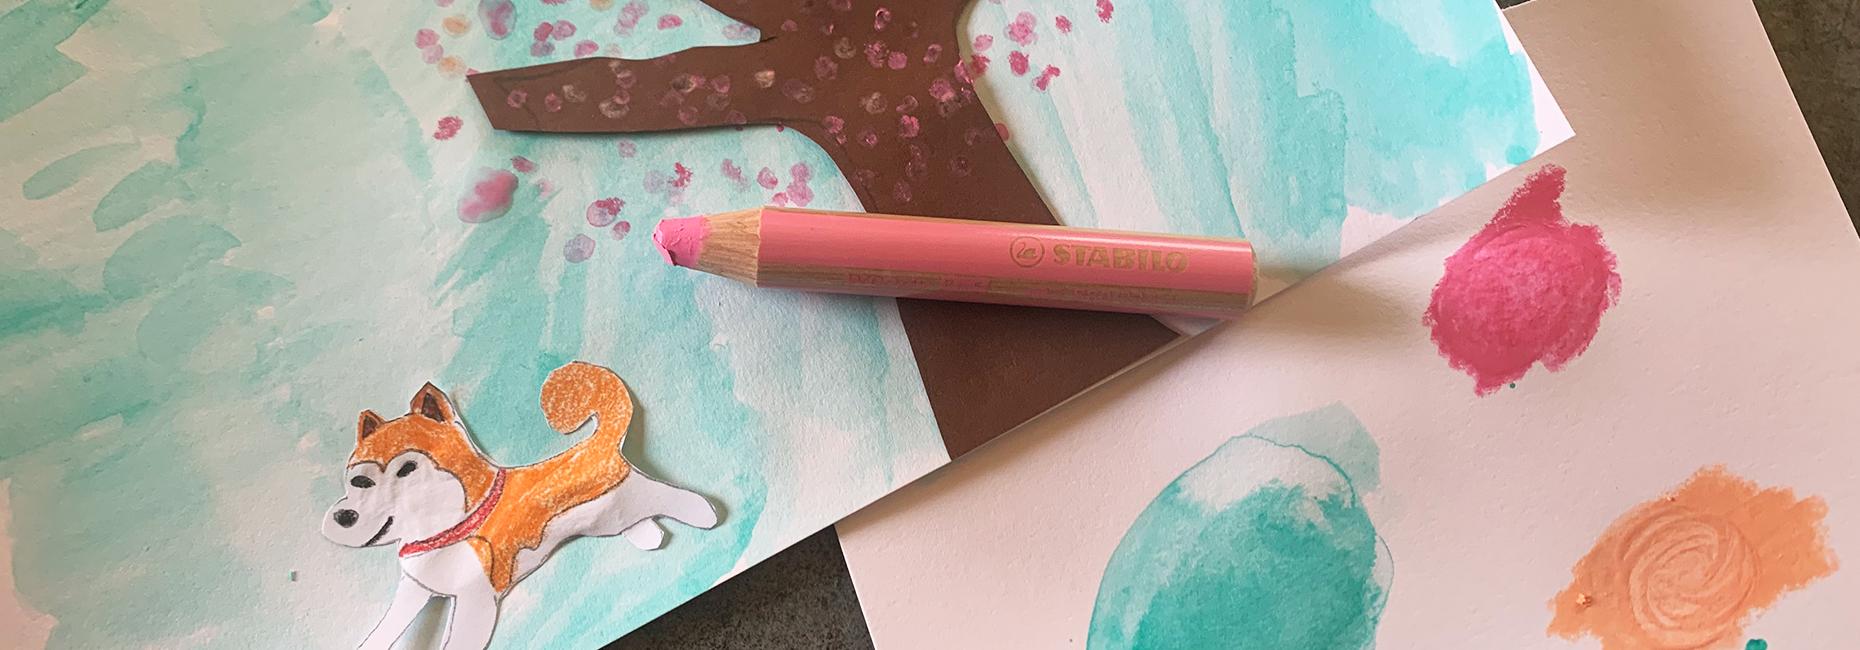 Atelier-STABILO-Sakura-1860x650px.jpg